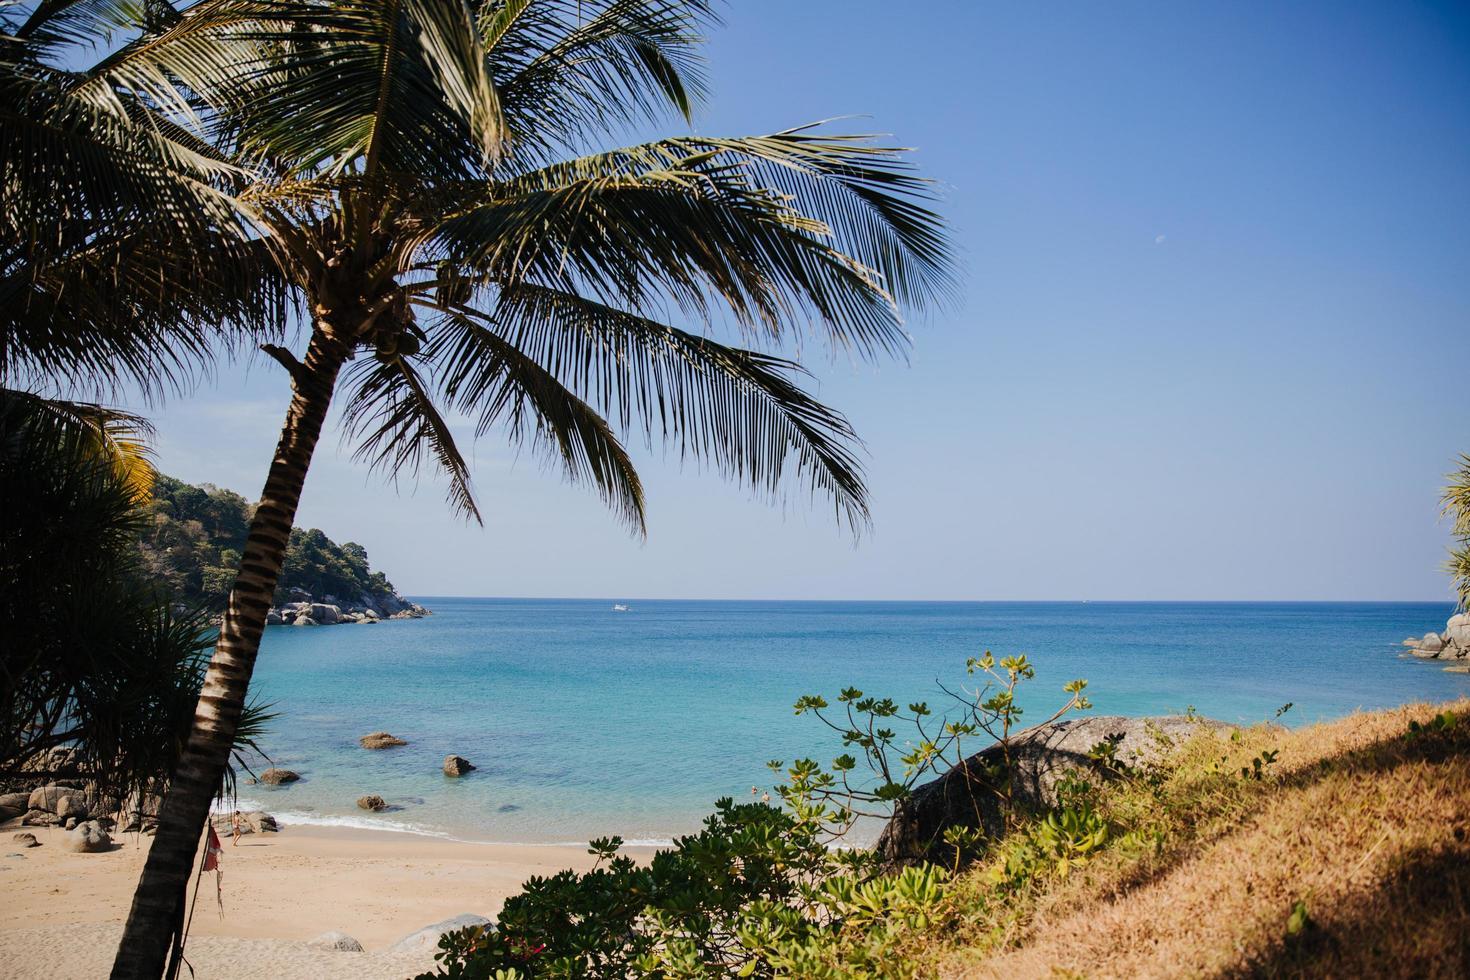 palmeira perto da praia foto